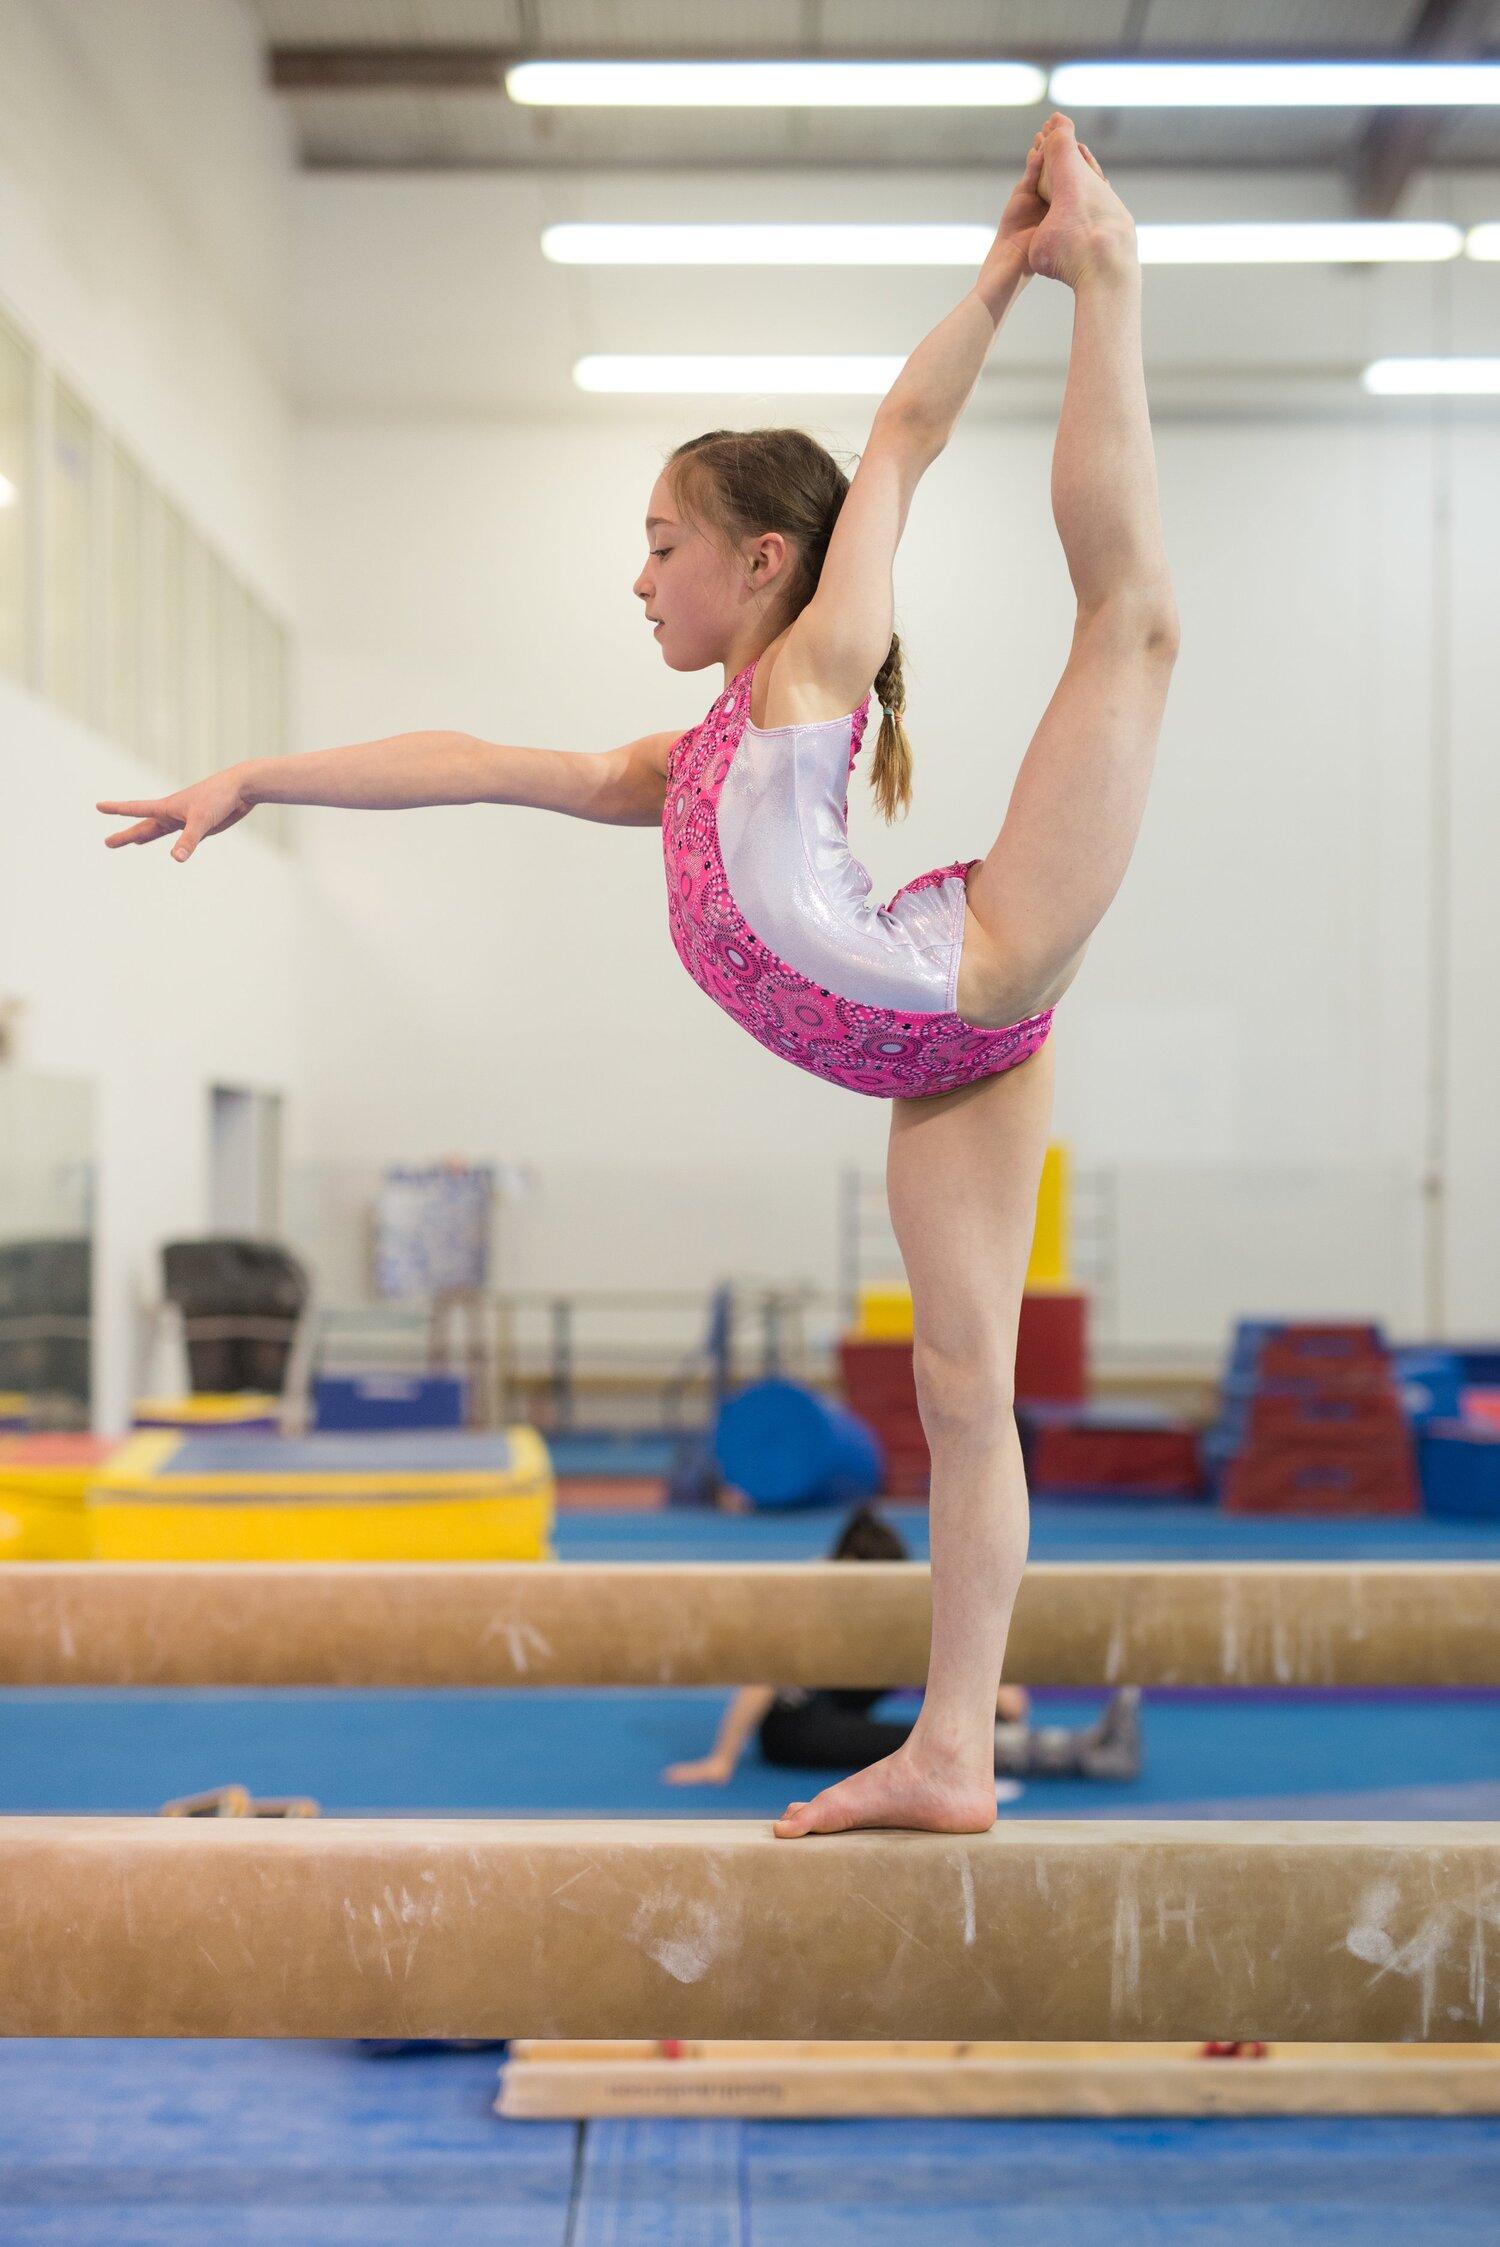 Gymnastics education - Gym Starz, the Leading Gymnastics